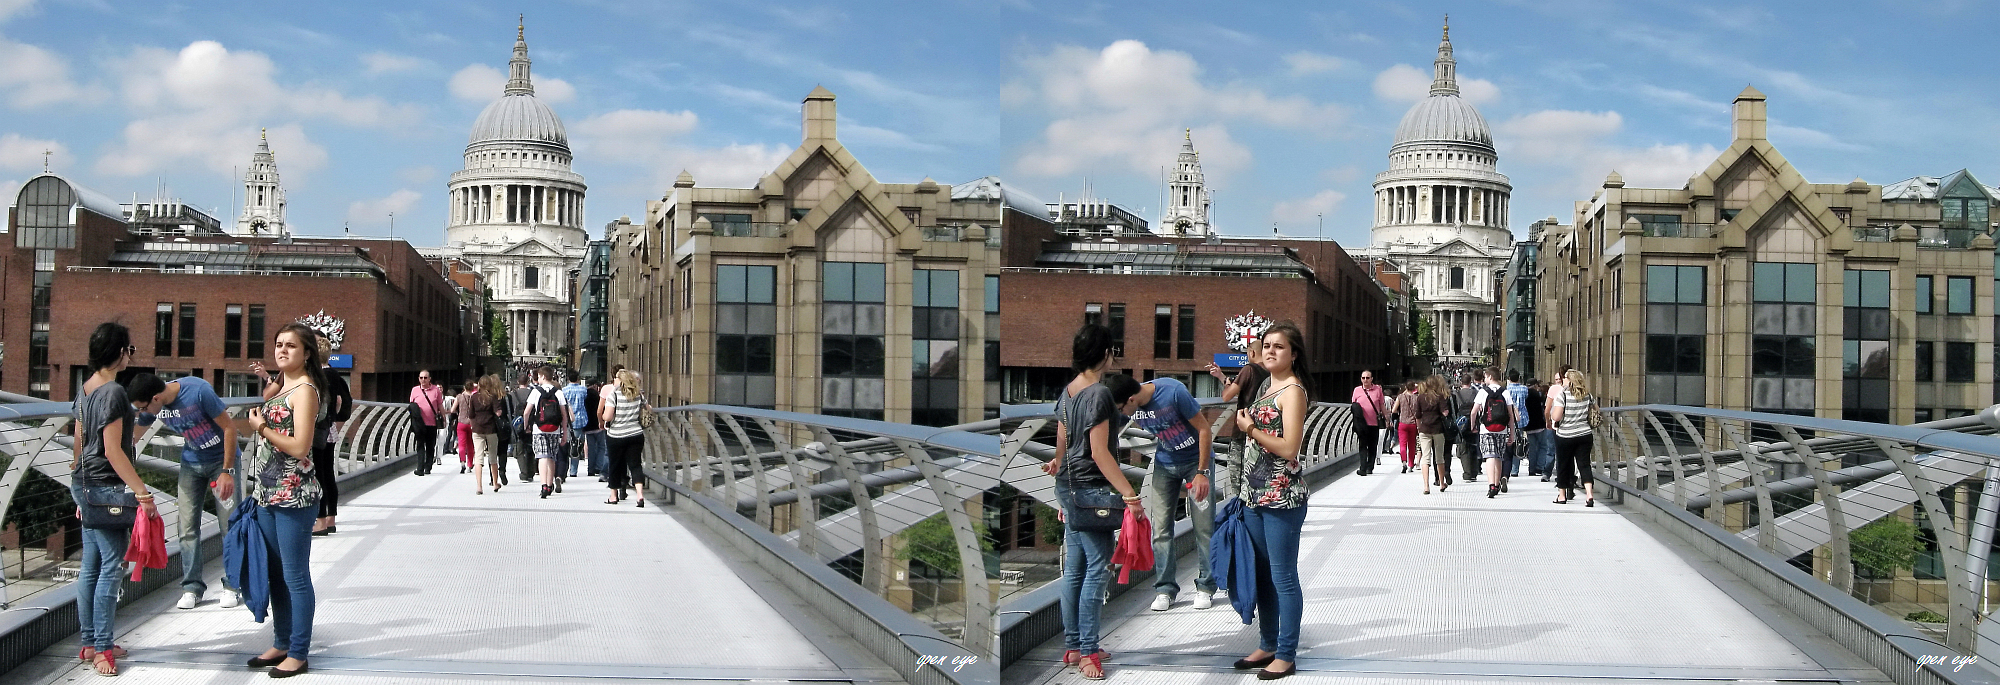 London Millennium BridgeMG_8440